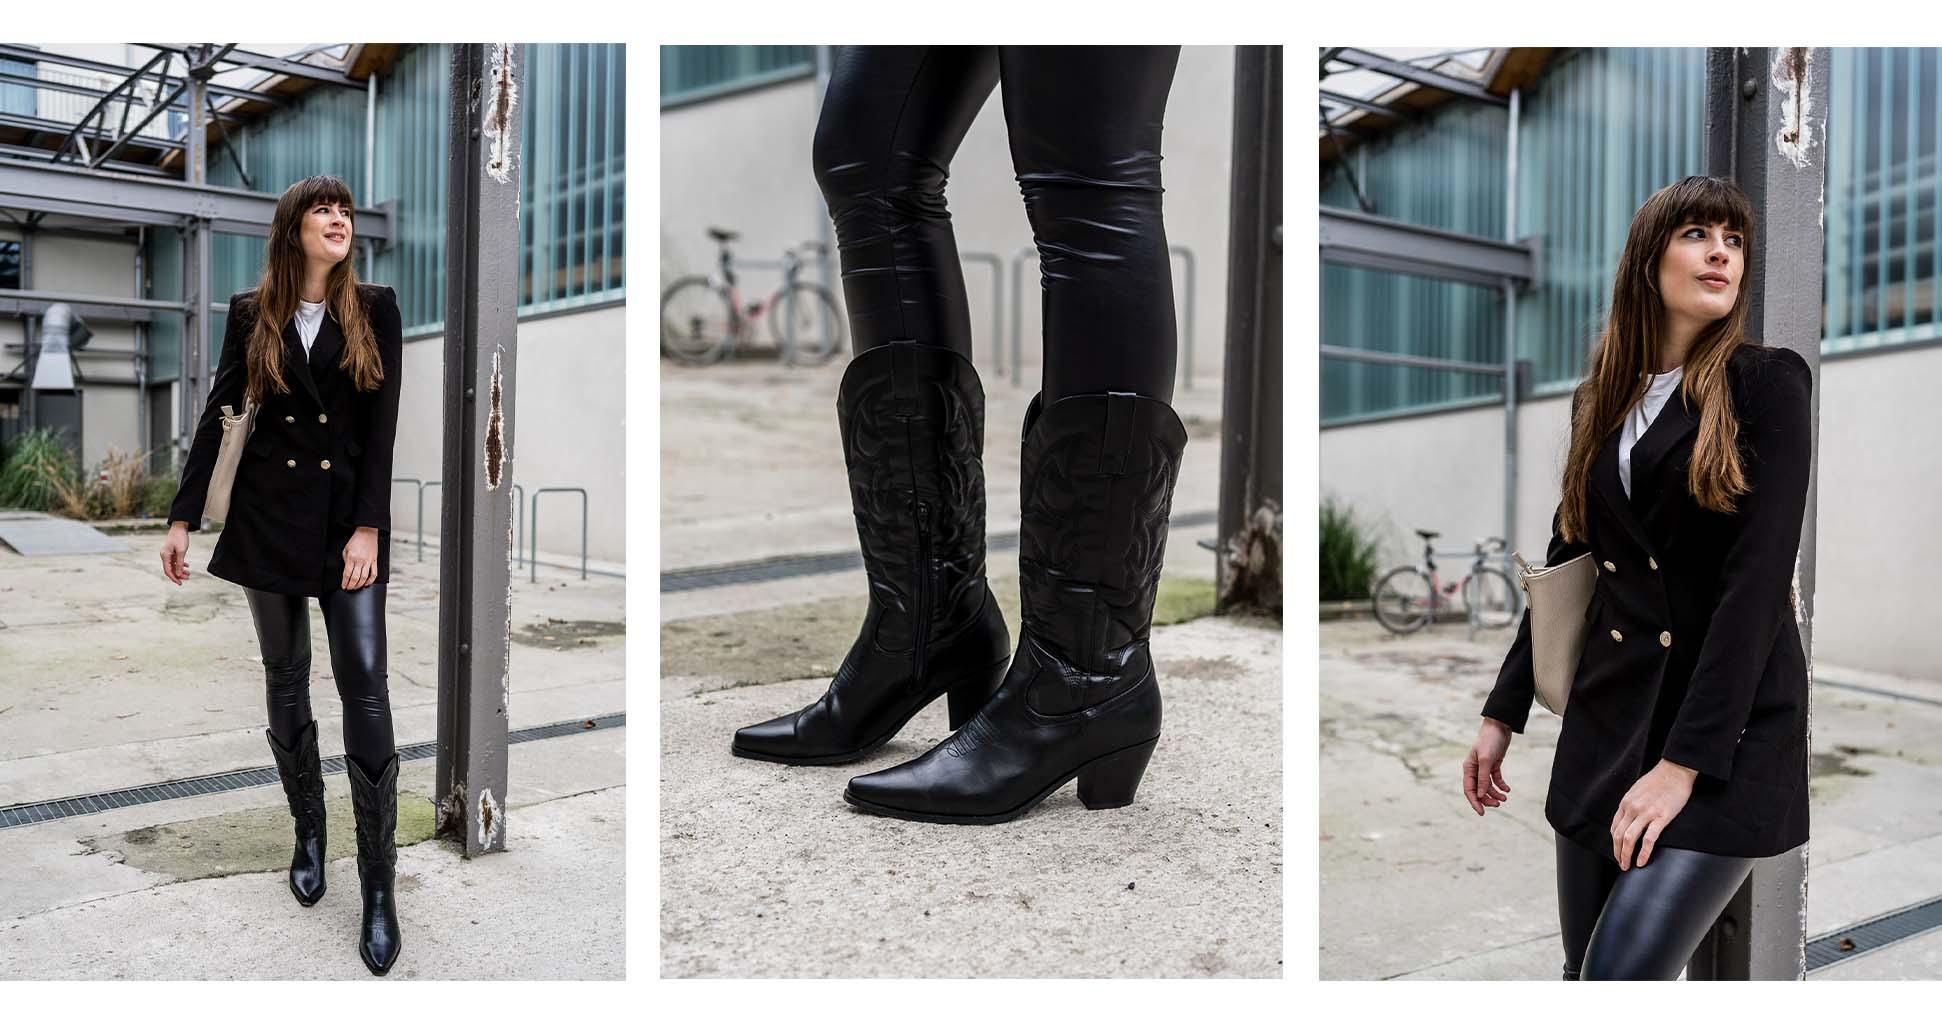 Mode Basics für das Winter-Outfit